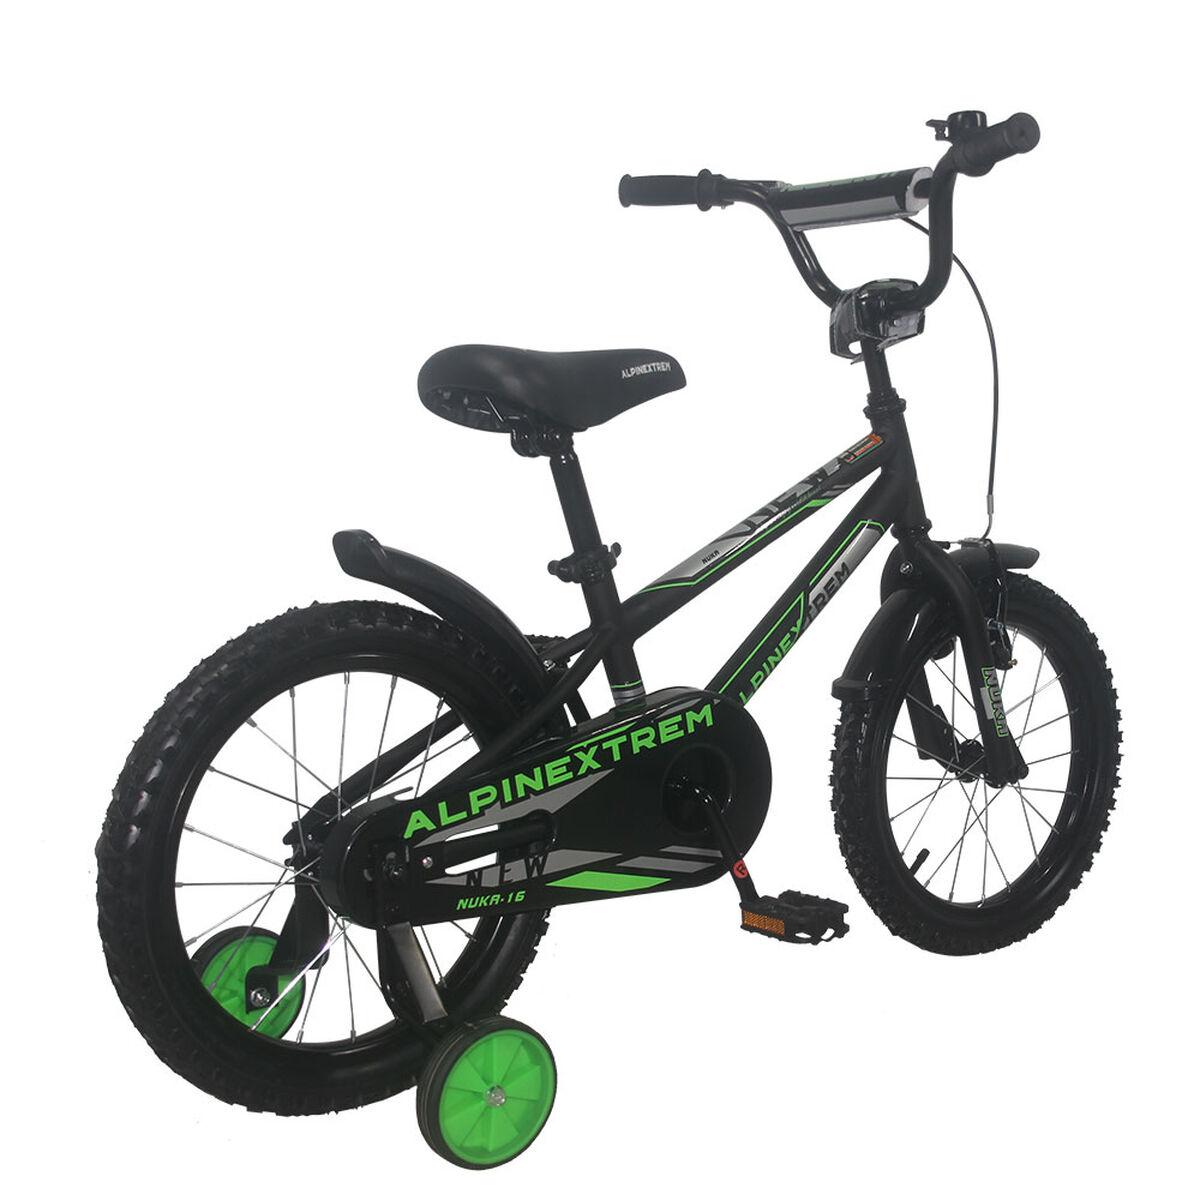 Bicicleta Niño Alpinextrem Nuka Aro 16